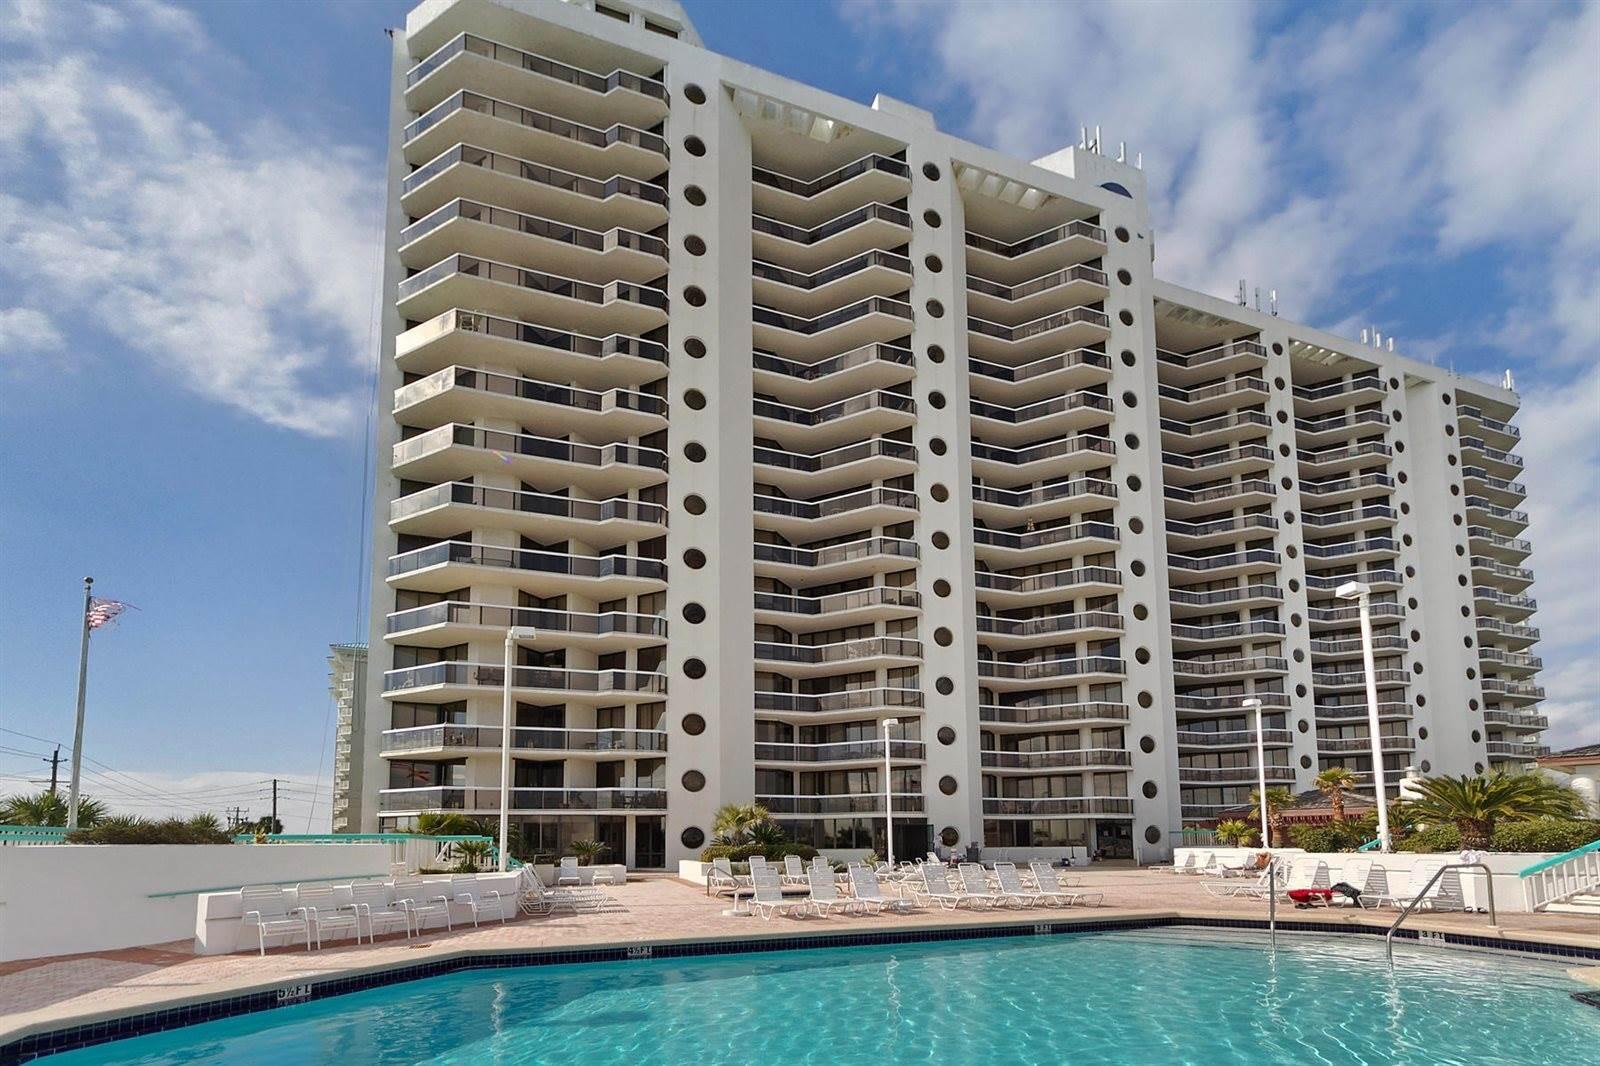 1096 Scenic Gulf Drive, Unit 1111, Miramar Beach, FL 32550